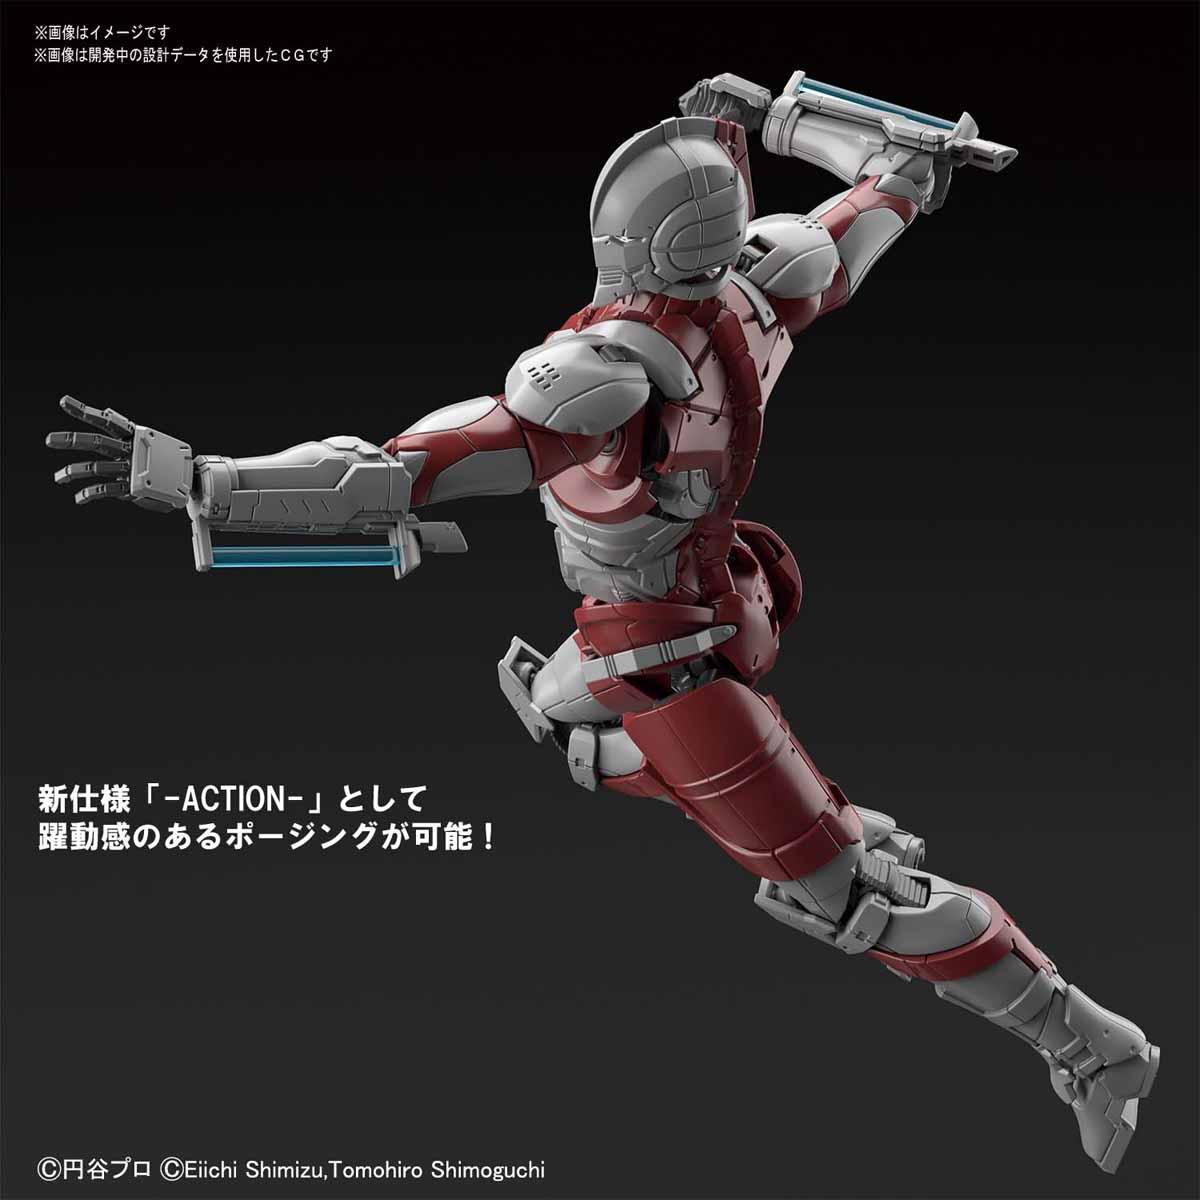 Figure-rise Standard『ULTRAMAN [B TYPE] -ACTION-』ウルトラマンスーツ 1/12 プラモデル-001